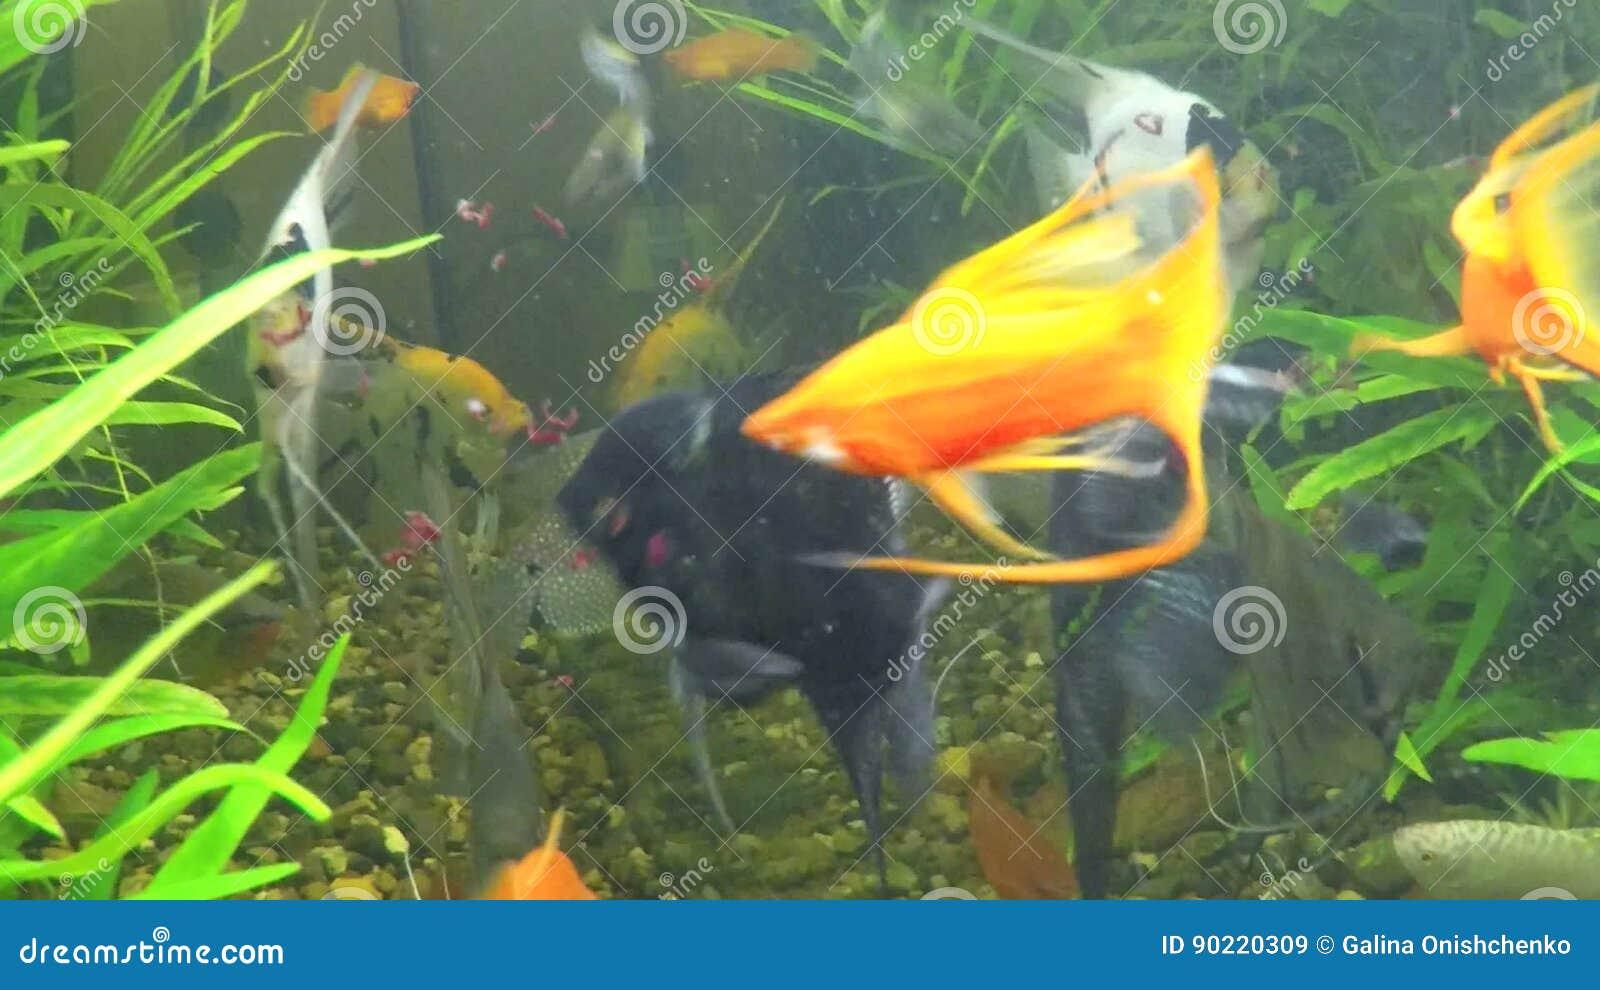 Fish Eat Worms In A Home Aquarium Stock Video Video Of Orange